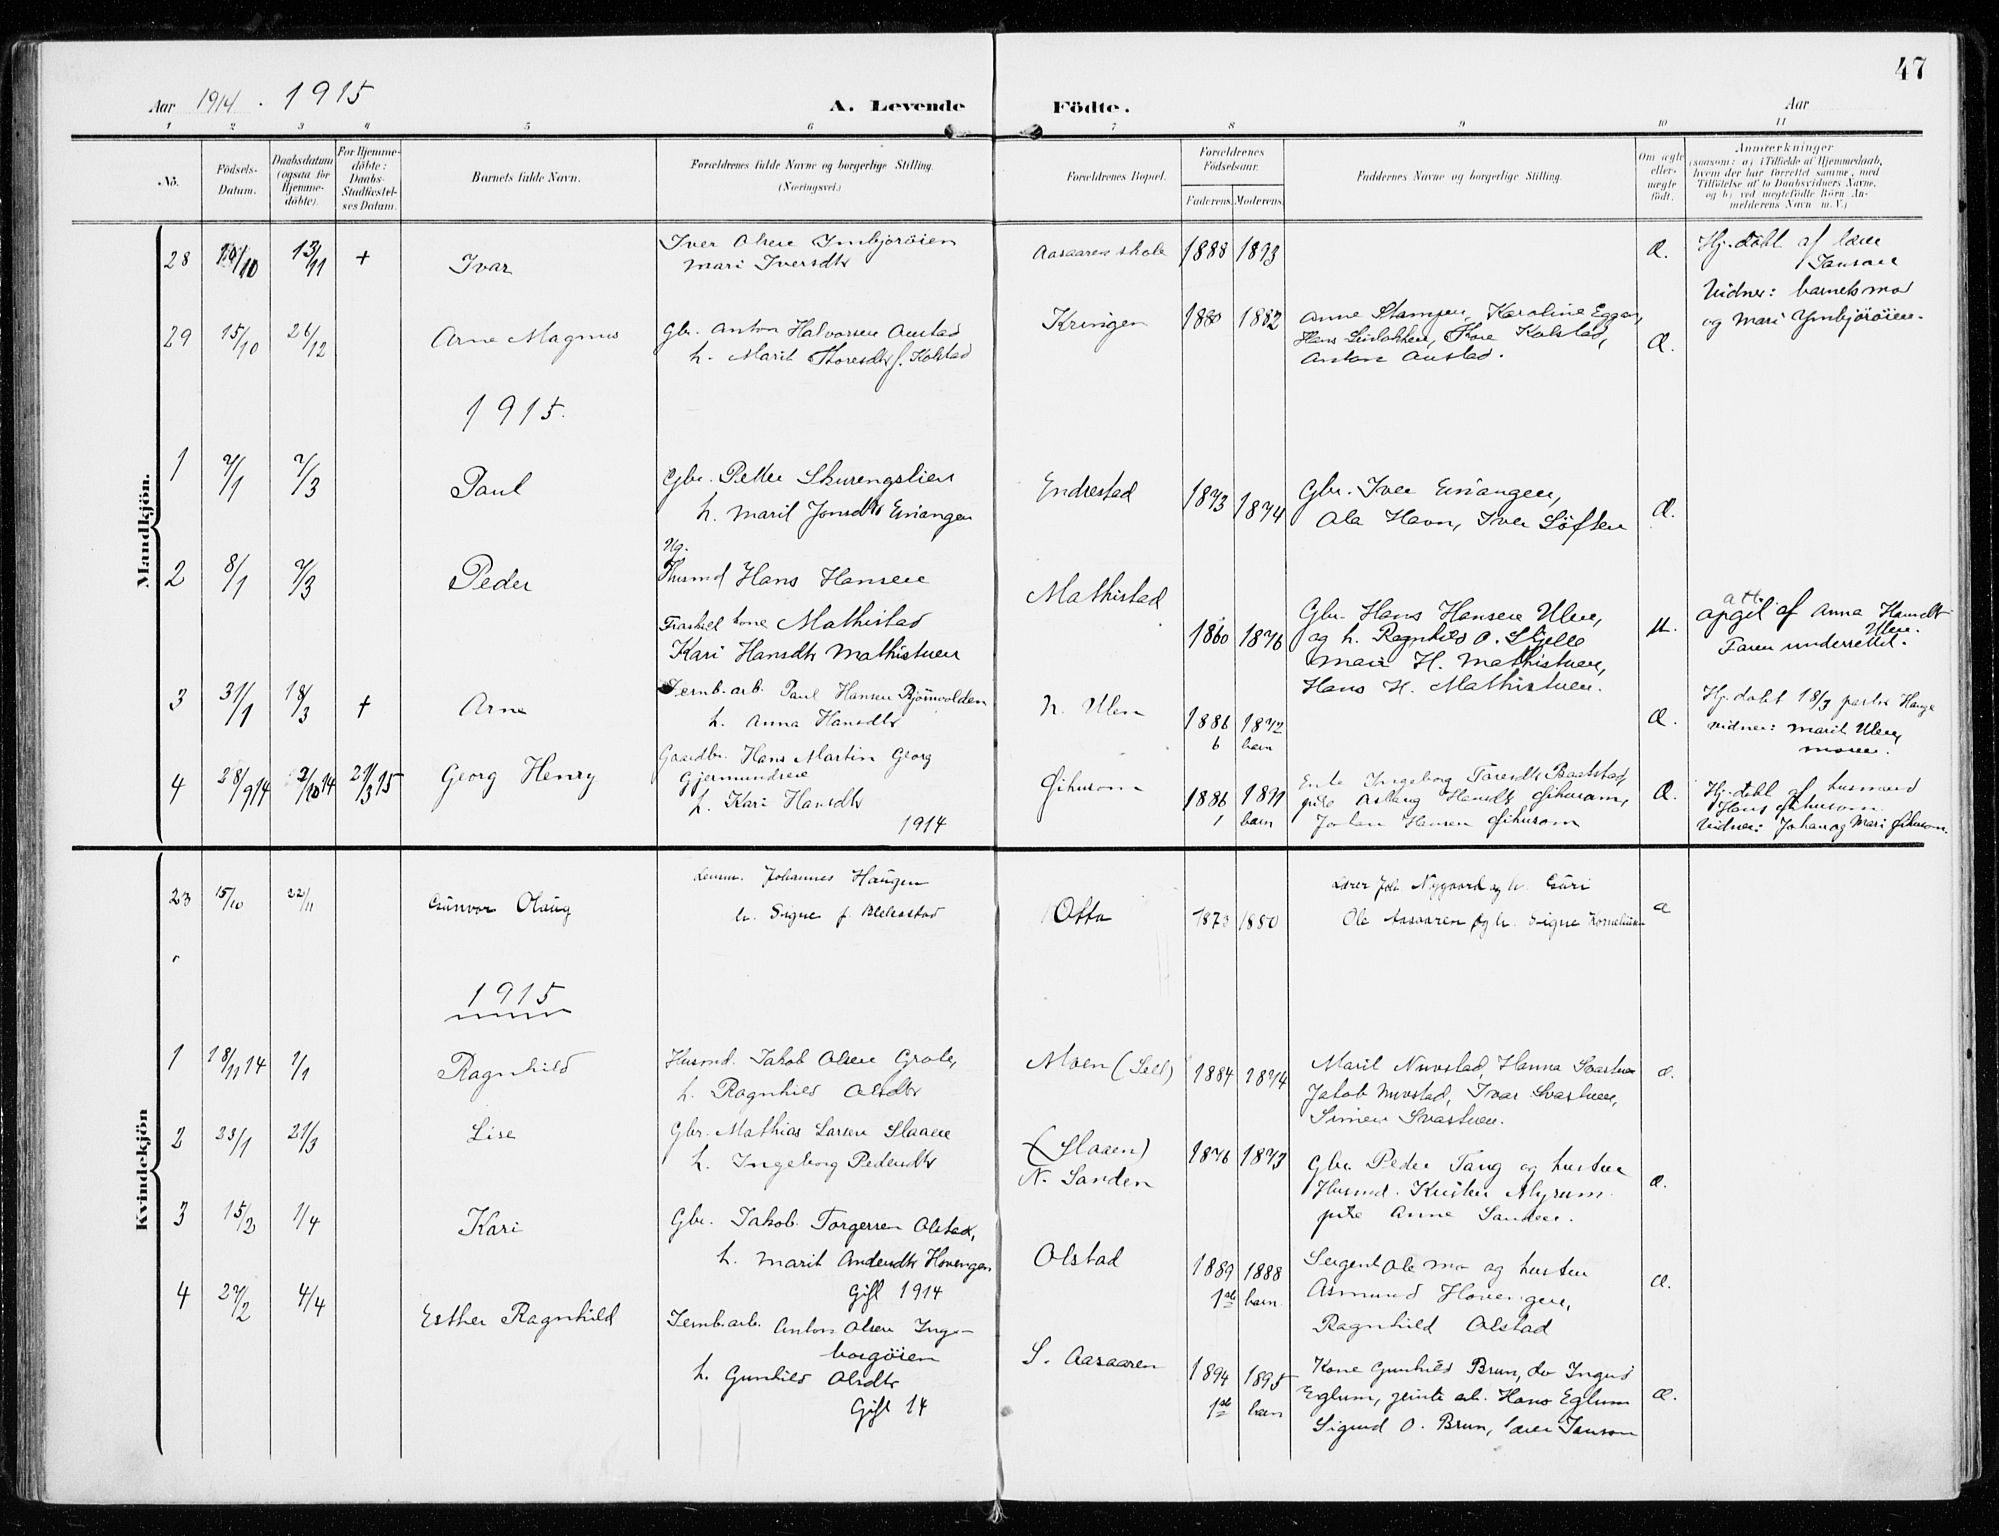 SAH, Sel prestekontor, Ministerialbok nr. 2, 1905-1919, s. 47